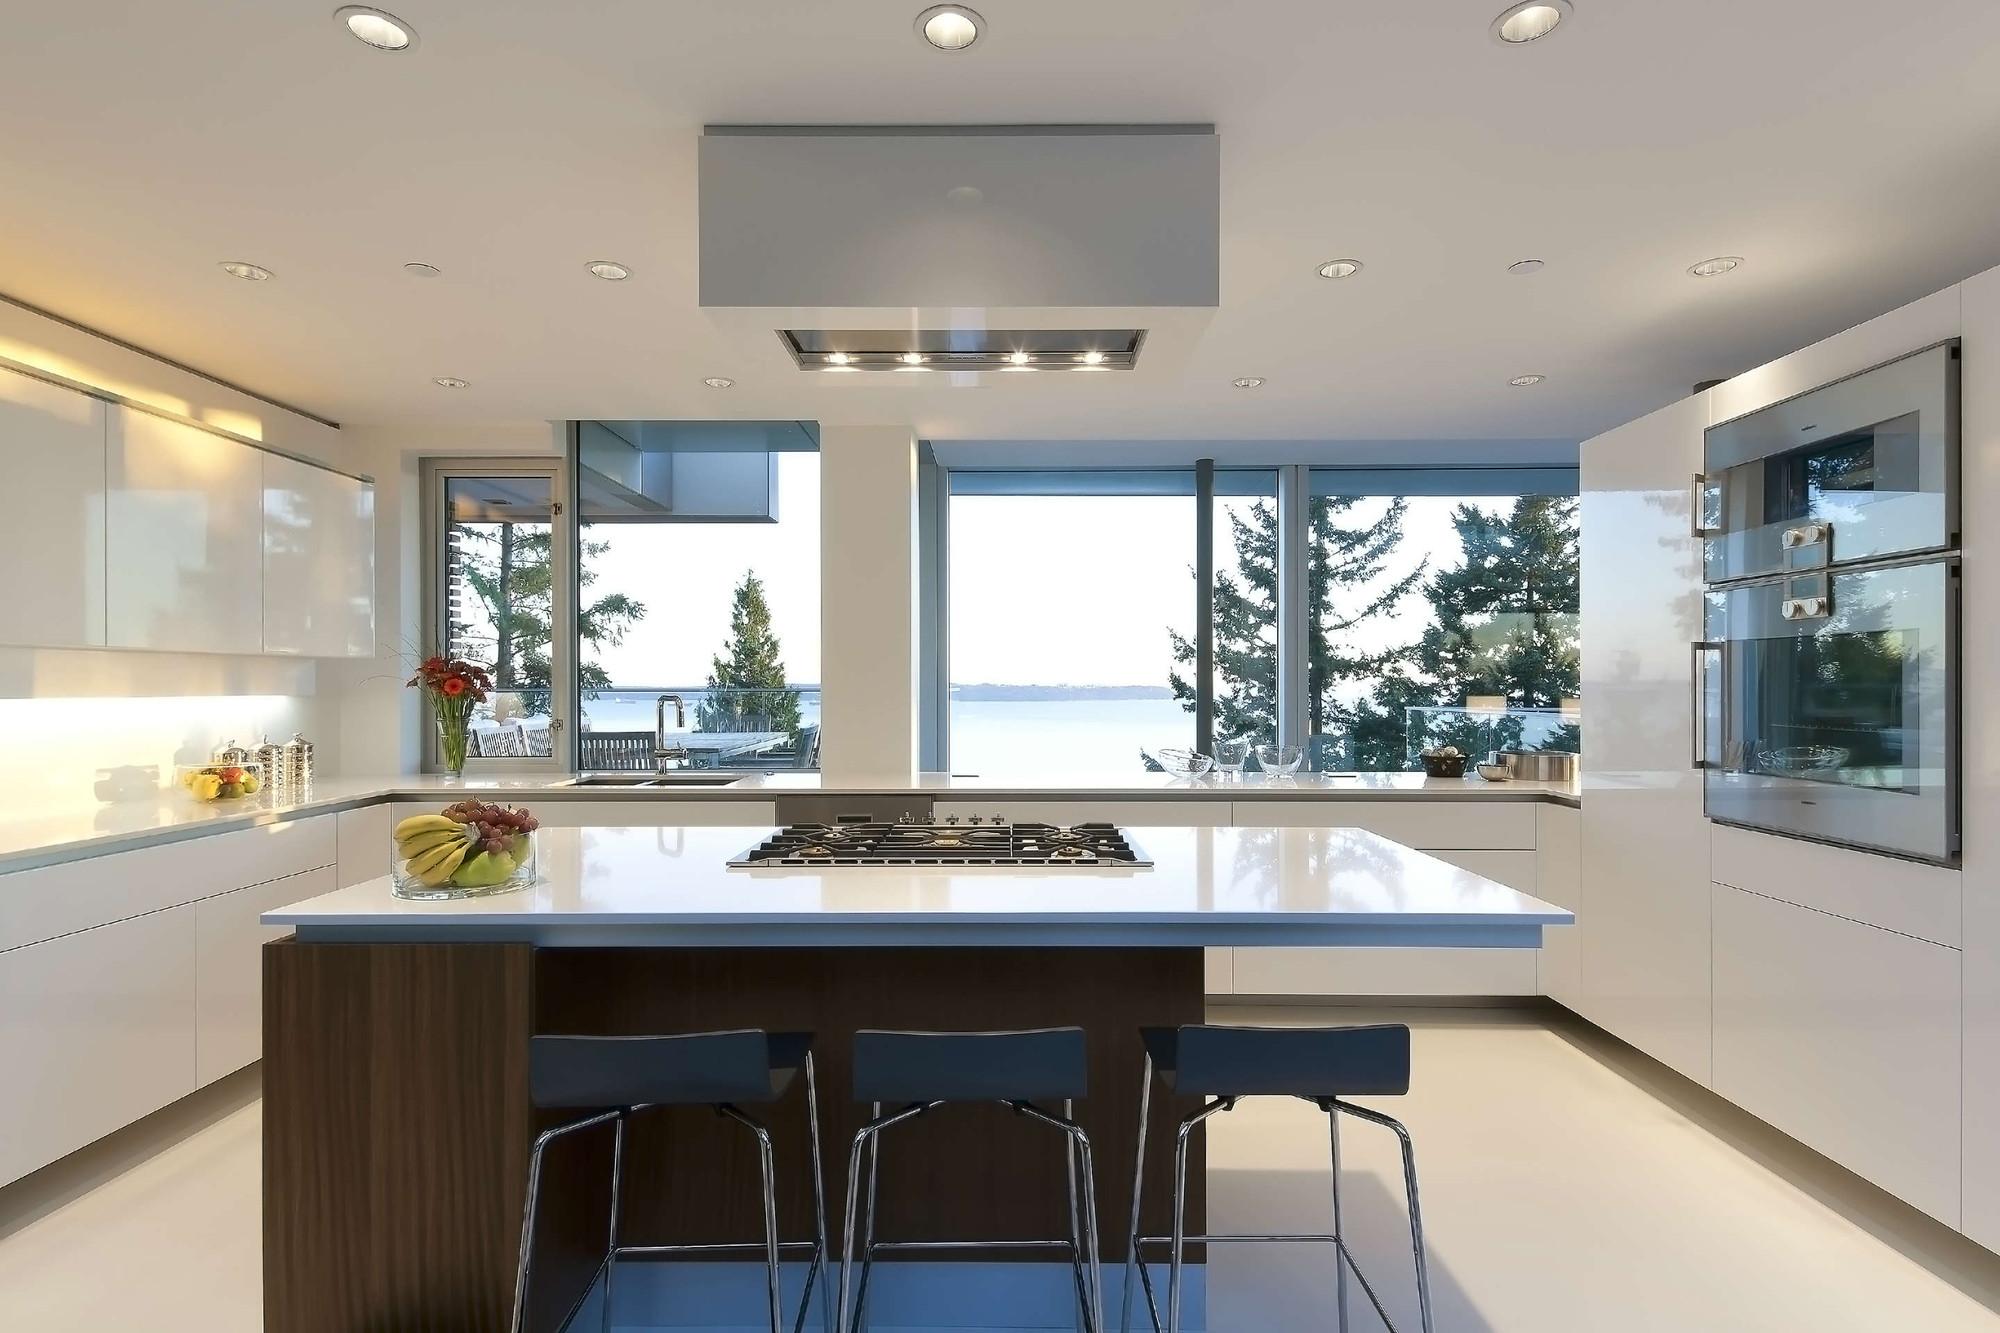 House 4249 / DGBK Architects